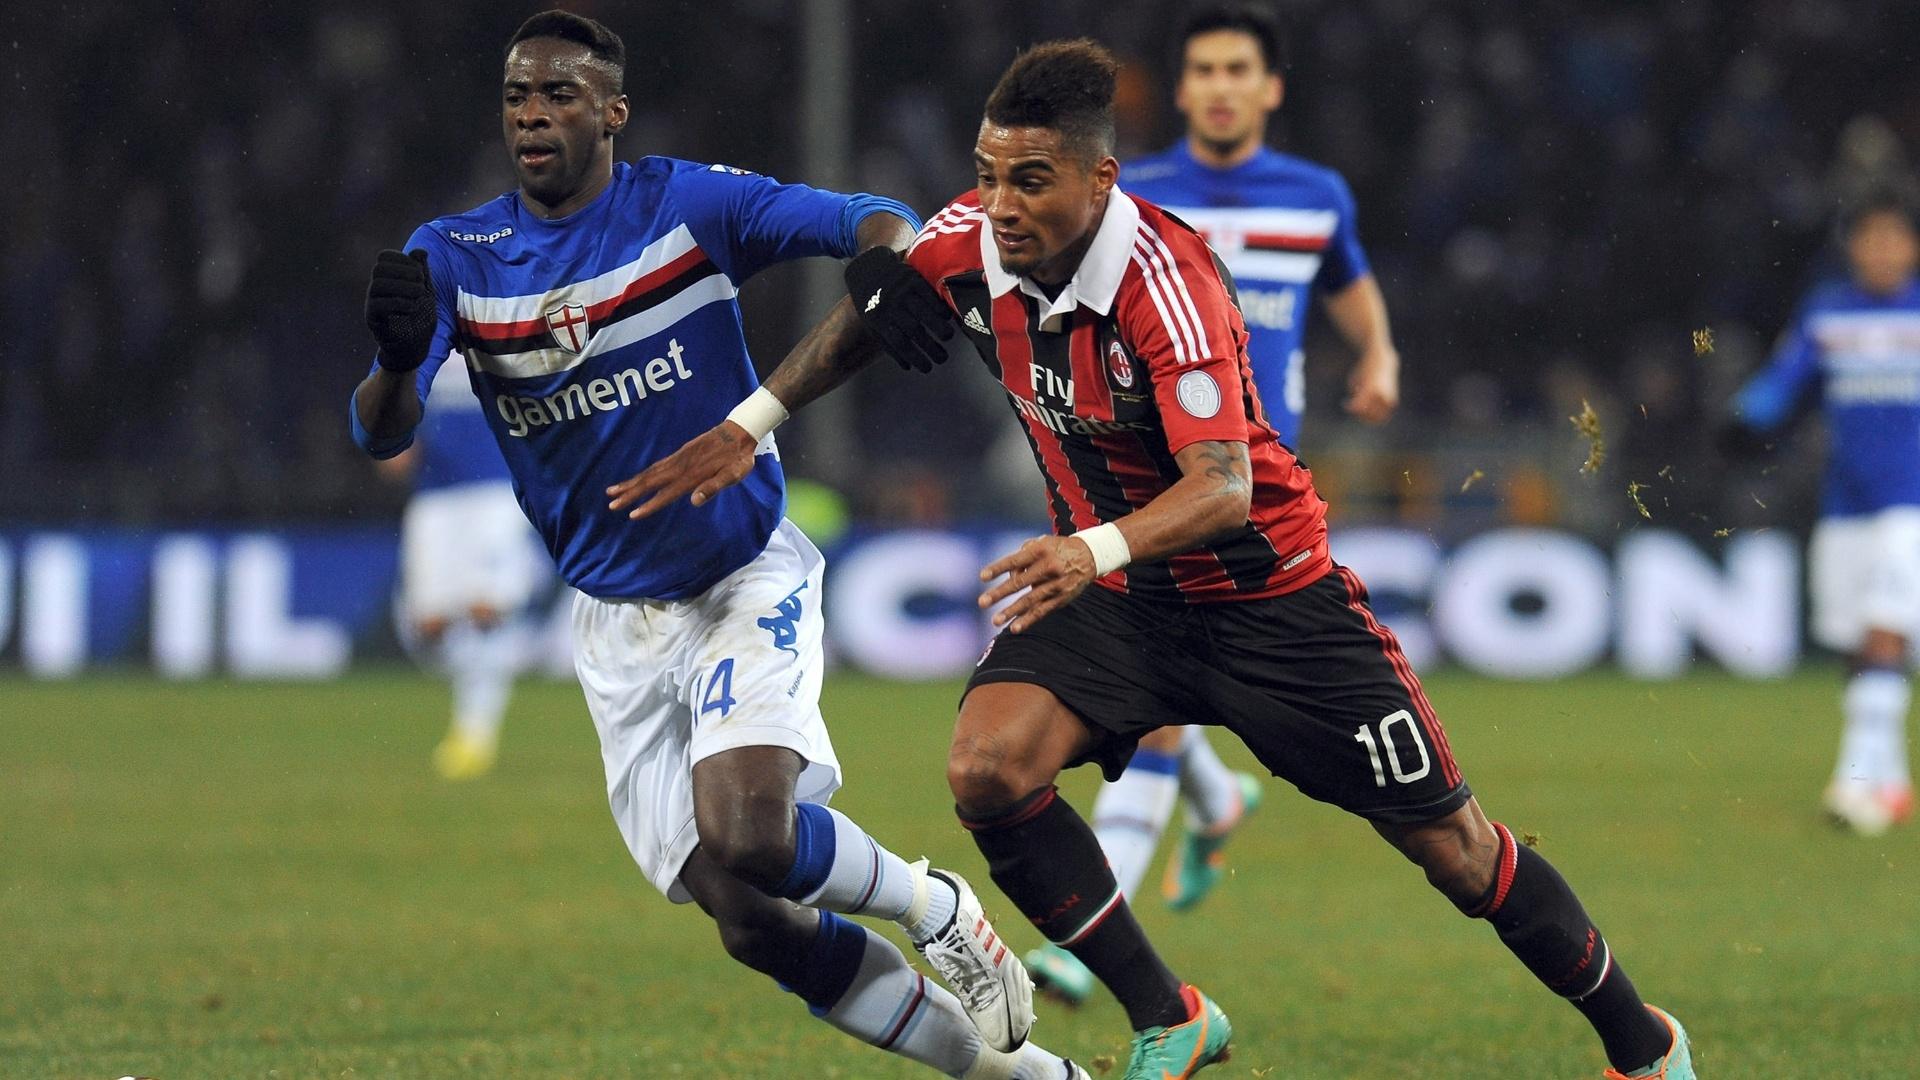 13.jan.2013 - Kevin Prince-Boateng, do Milan, tenta jogada enquanto é marcado por Pedro Obiang, da Sampdoria, durante jogo do Campeonato Italiano